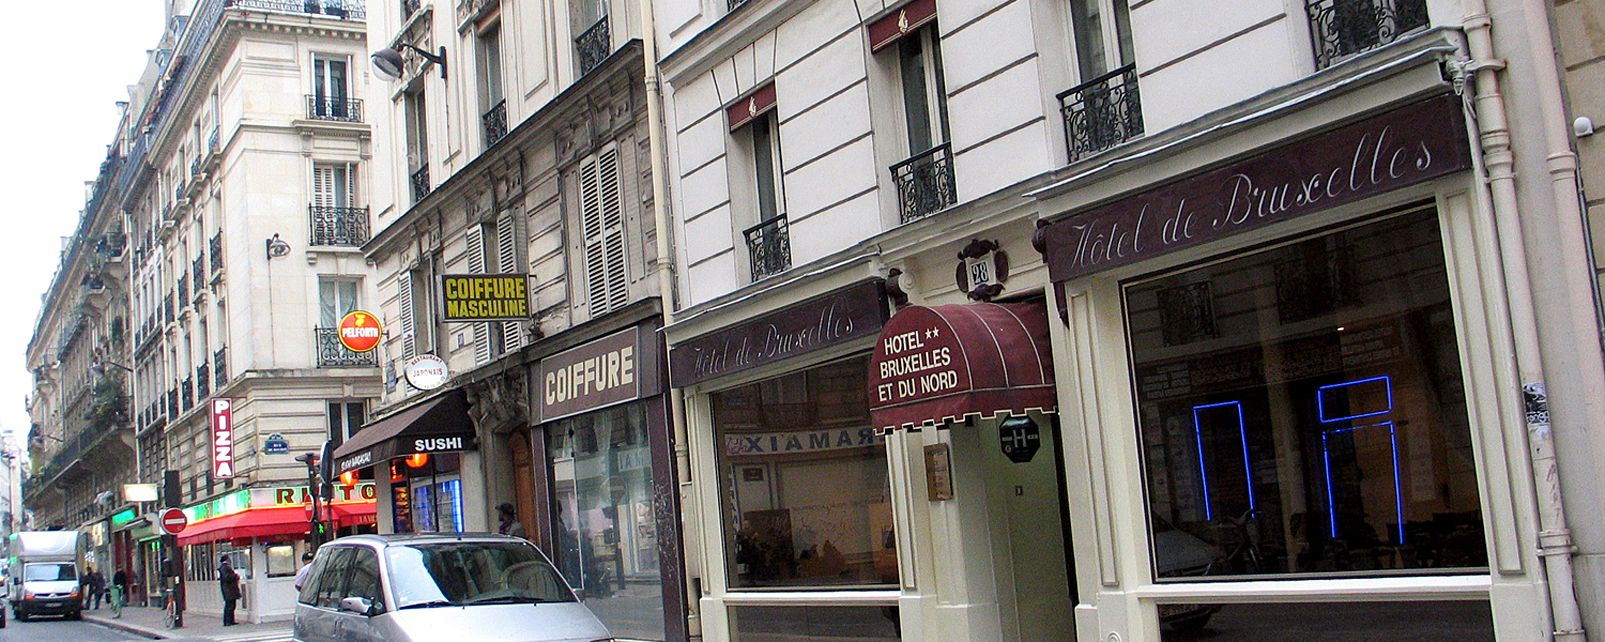 hotel bruxelles et du nord in paris. Black Bedroom Furniture Sets. Home Design Ideas